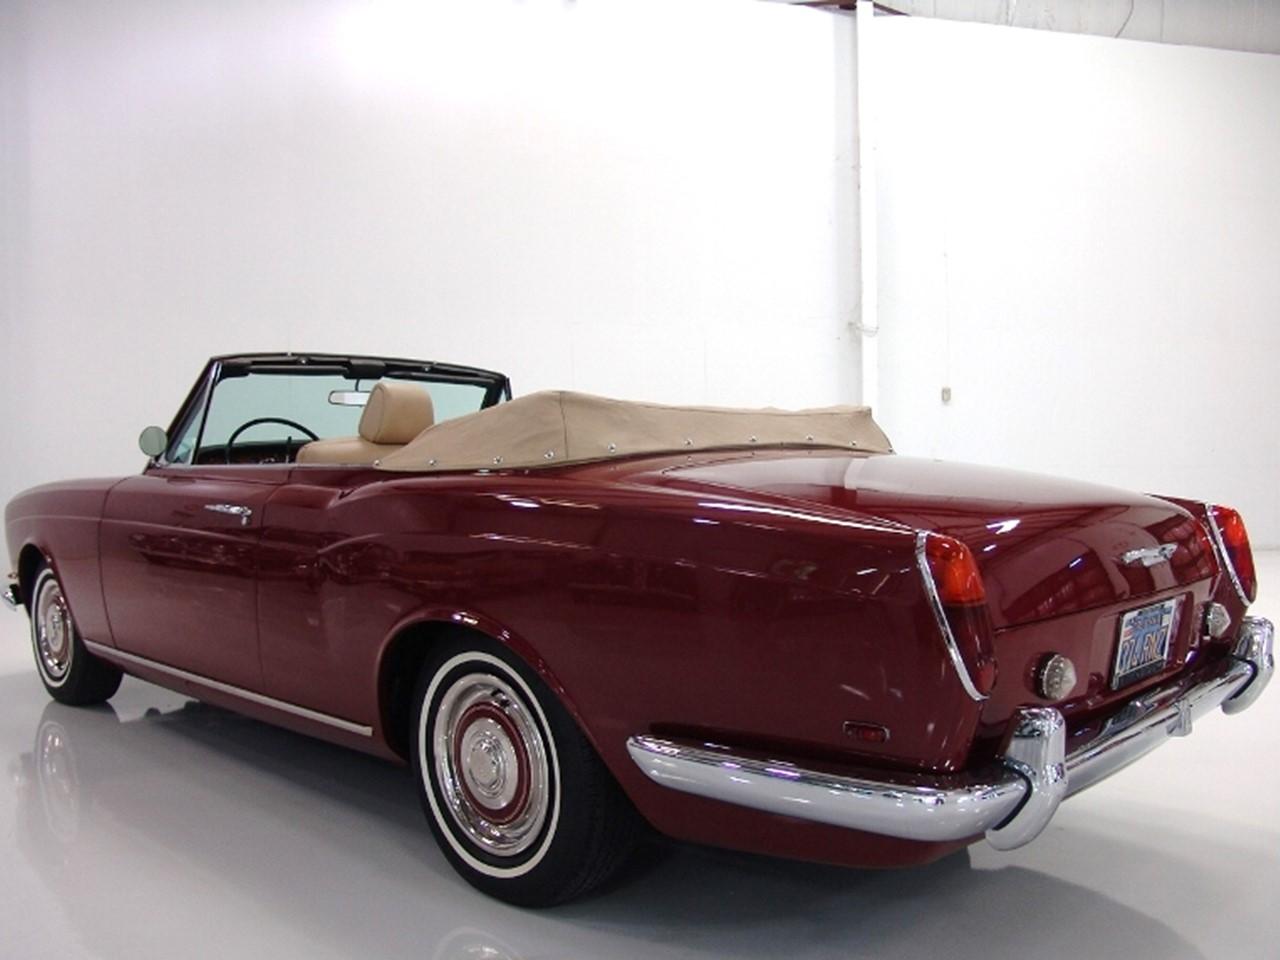 1969 rolls royce silver shadow mpw drop head coupe notoriousluxury. Black Bedroom Furniture Sets. Home Design Ideas